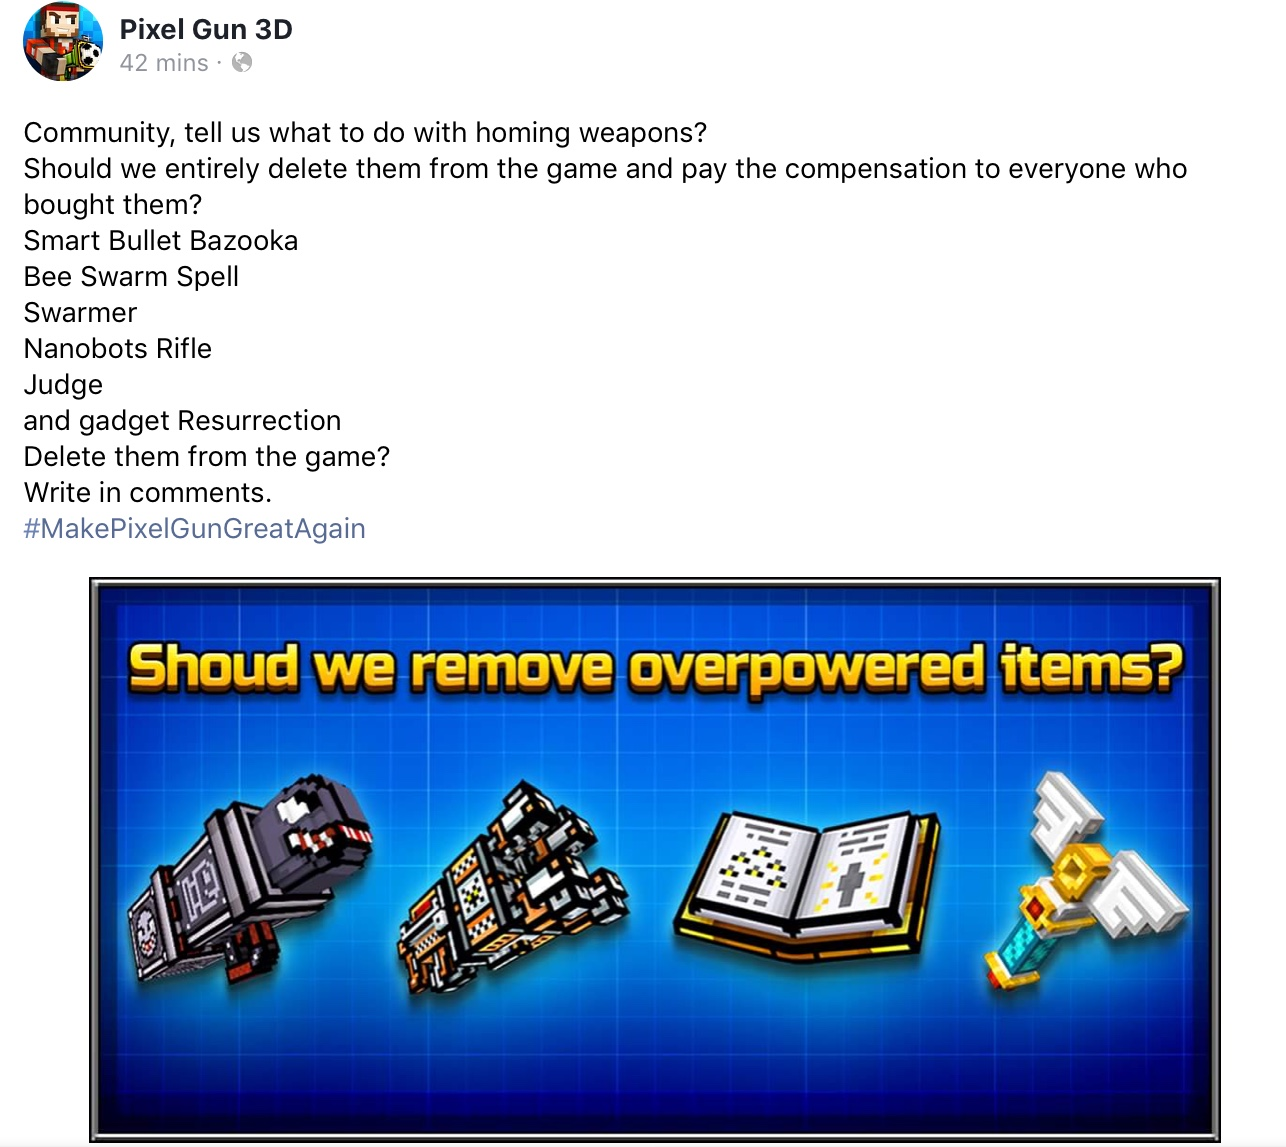 PG3D deleting OP weapons?